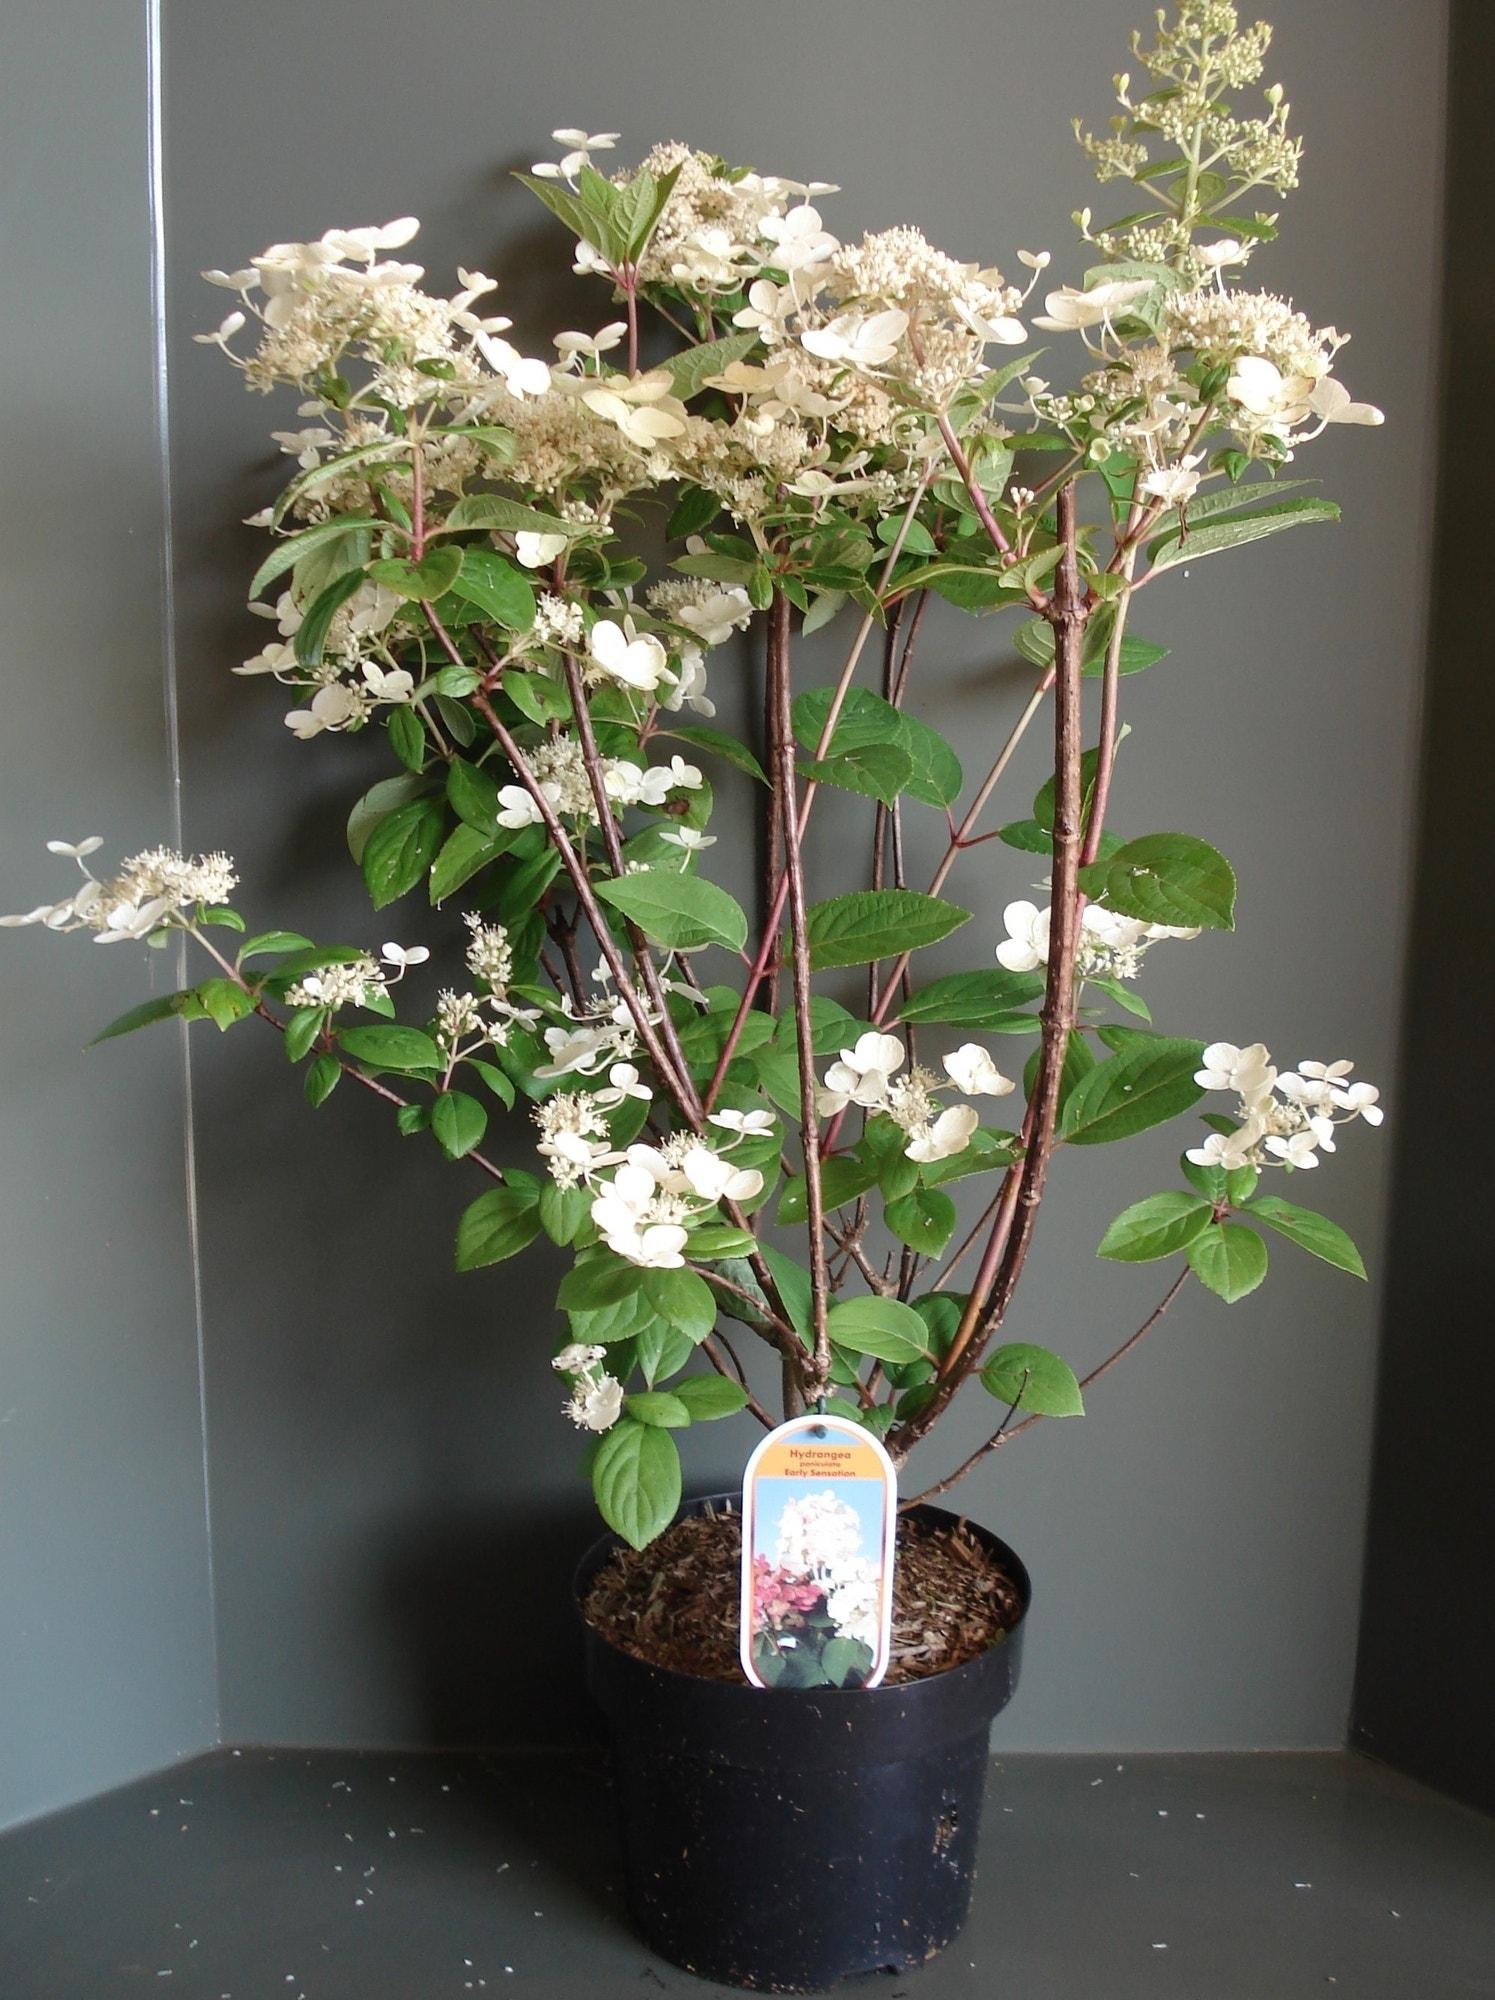 Pluimhortensia (Hydrangea paniculata 'Early Sensation') 30/40 cm. Kleur: meerkleurig